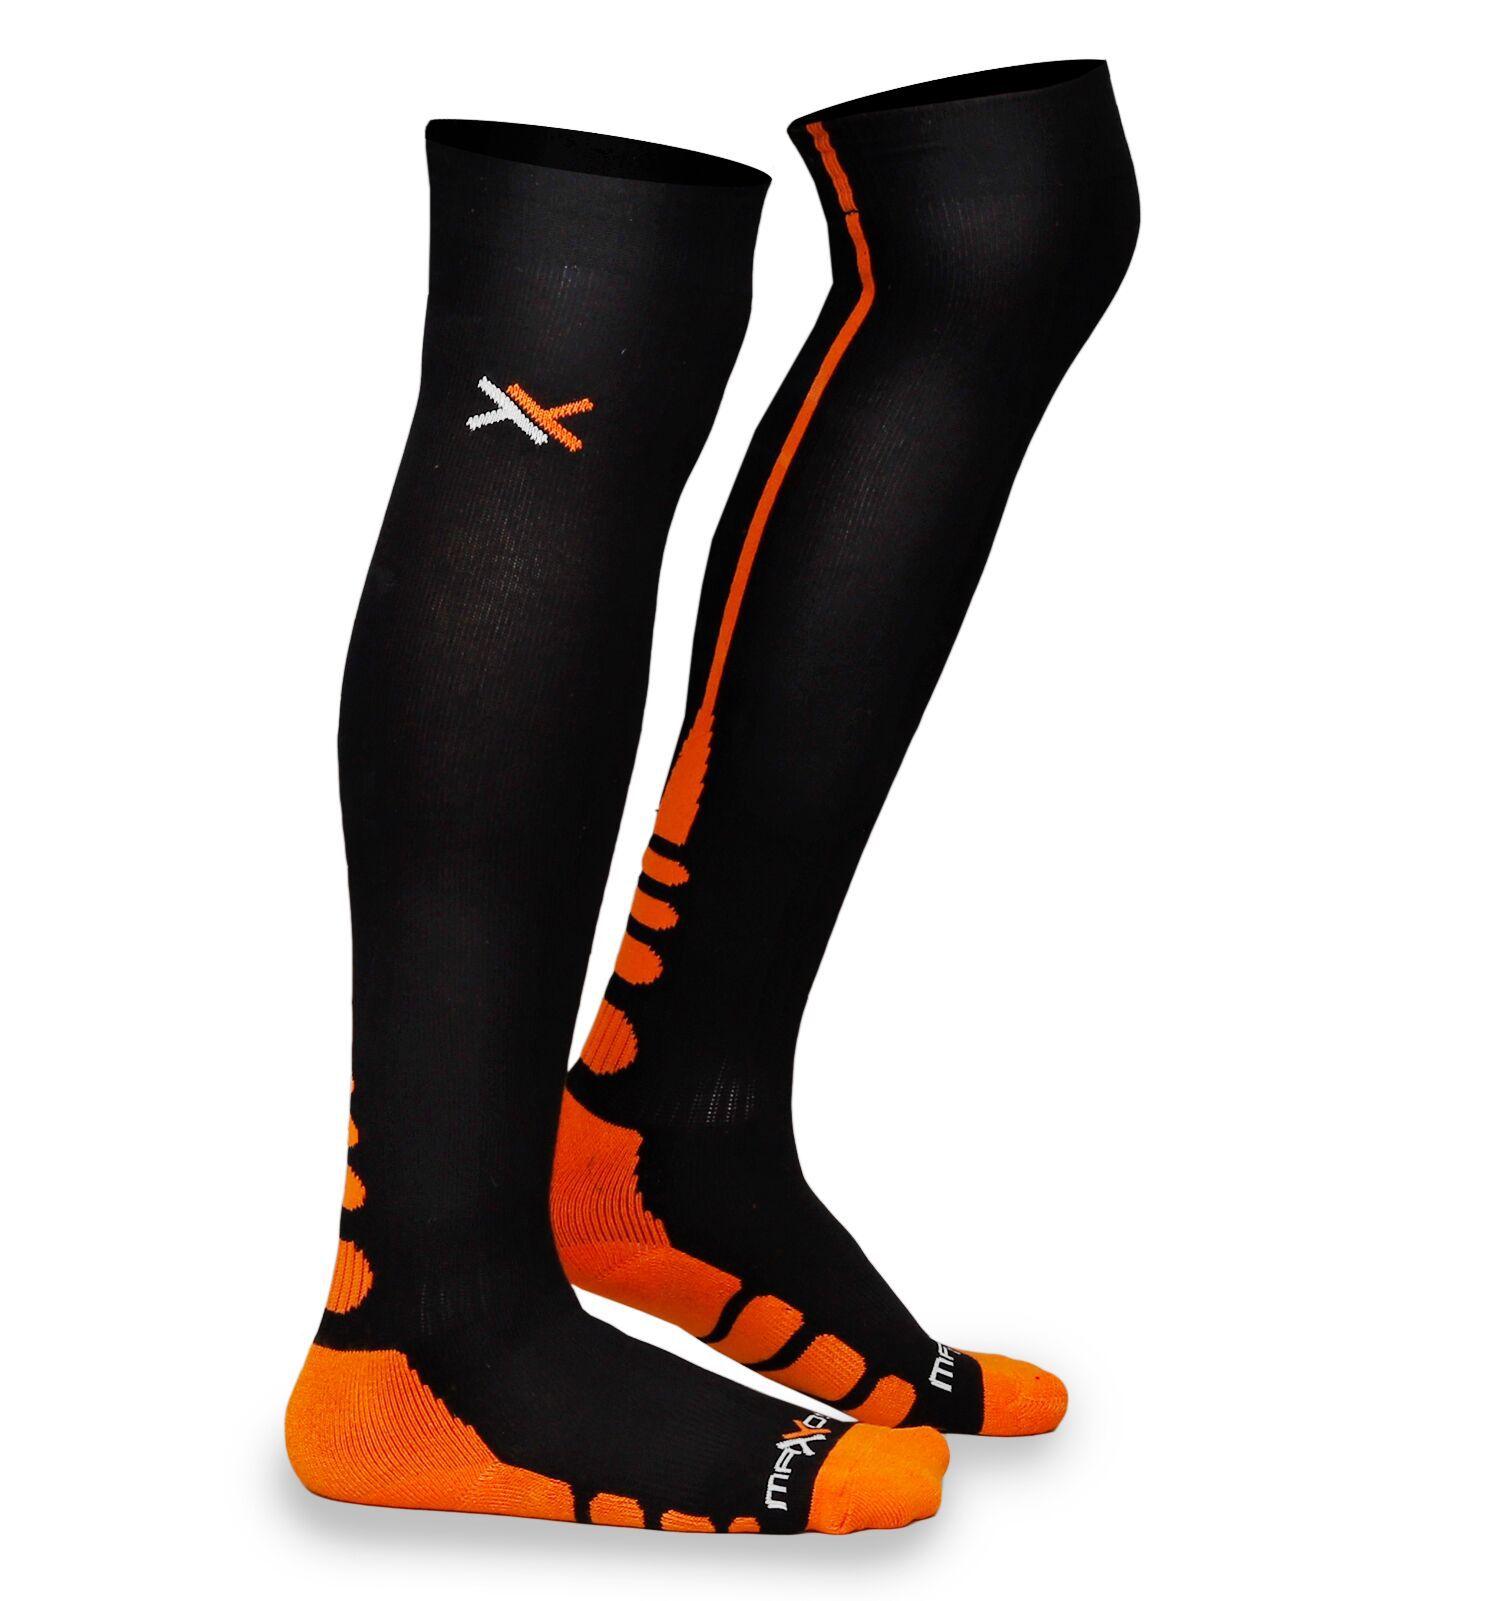 Meia Mattos Racing MX Socks